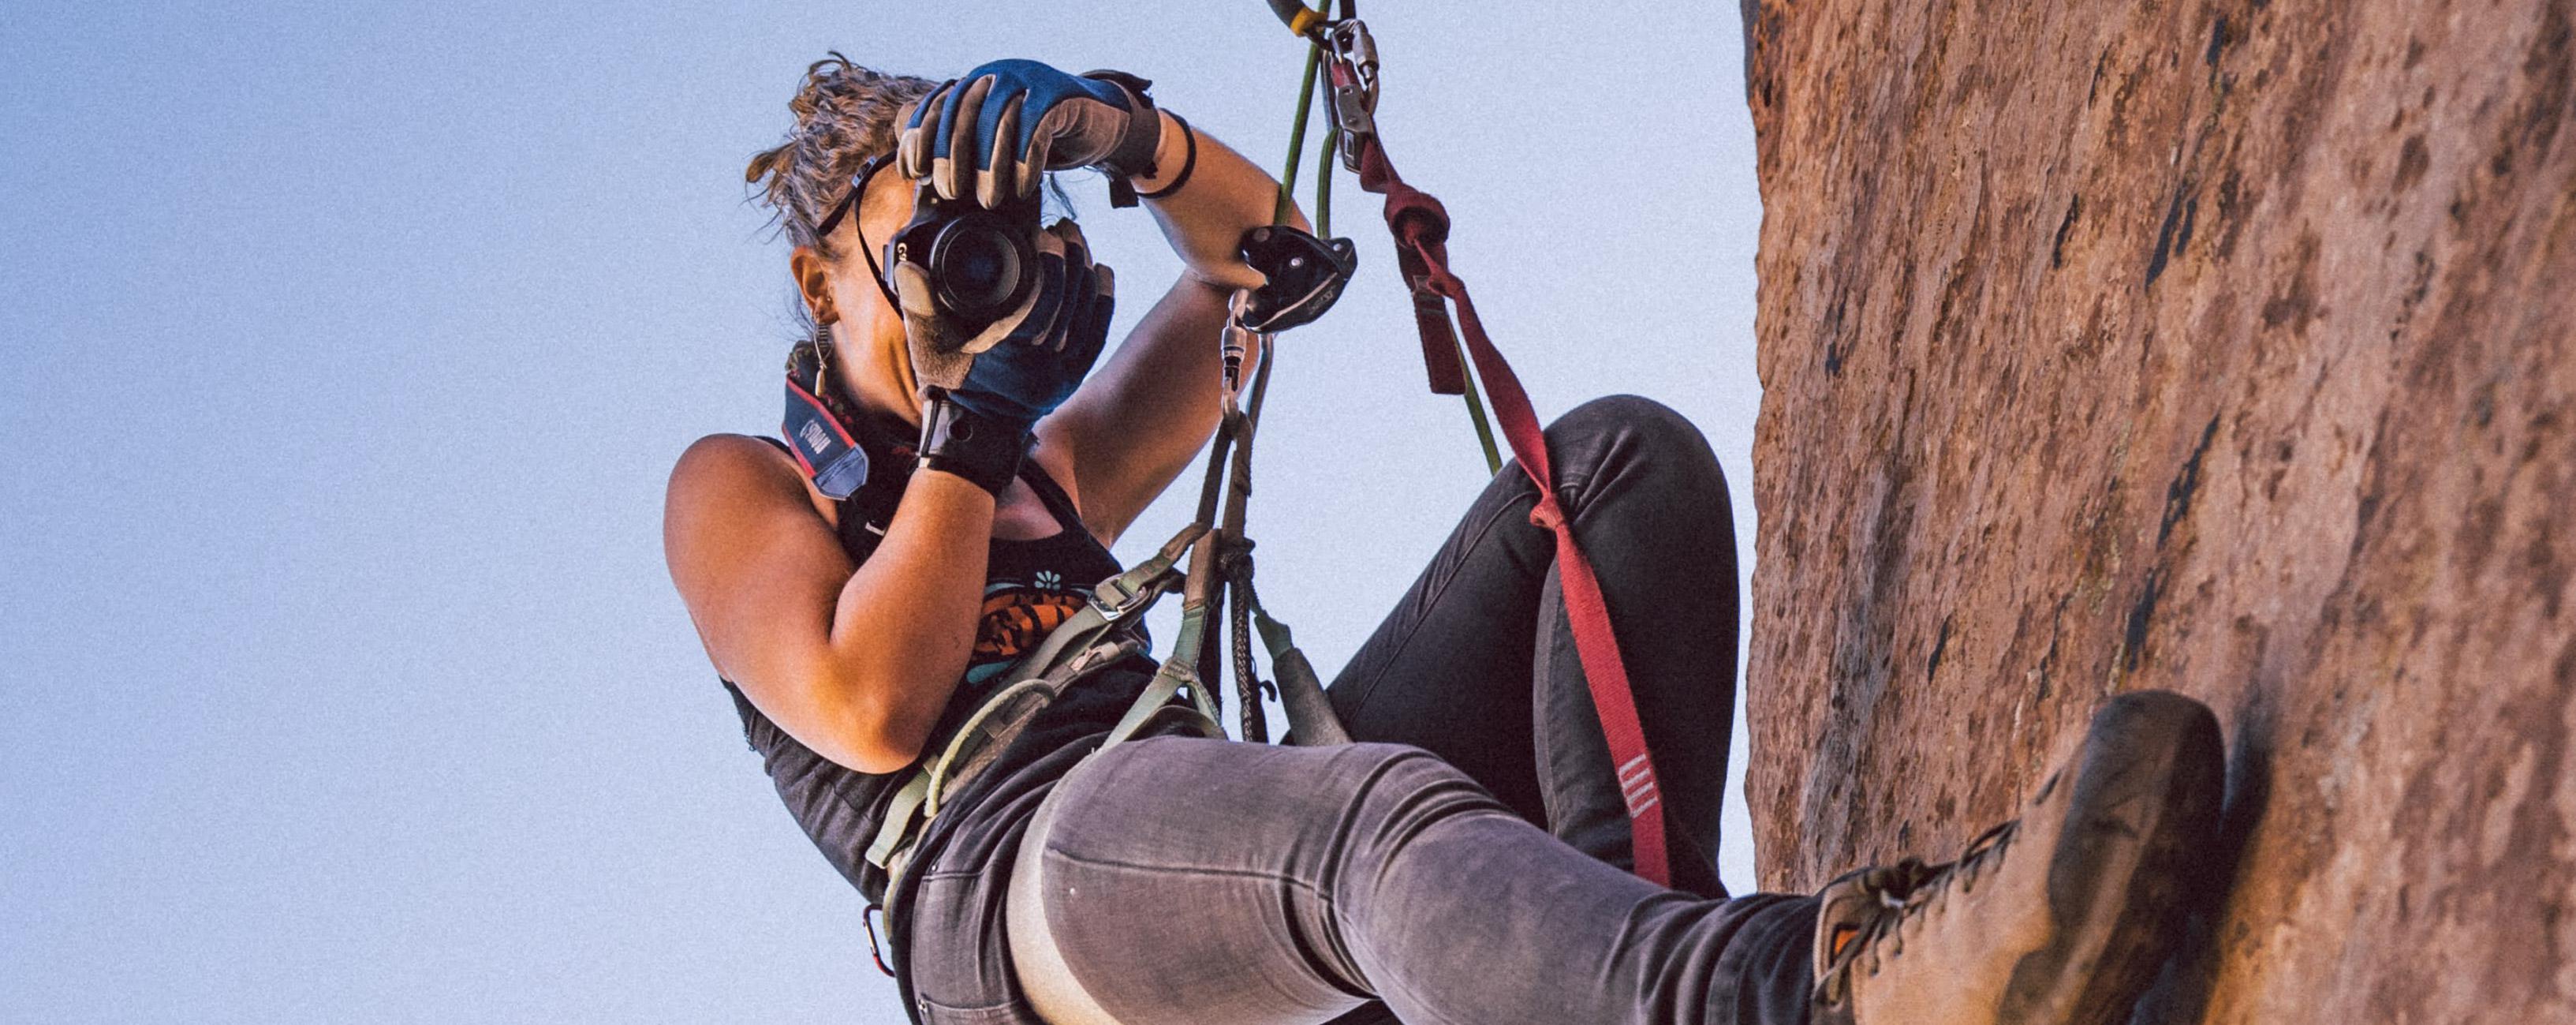 climbing-photography-basics-review-dirtbagdreams.com